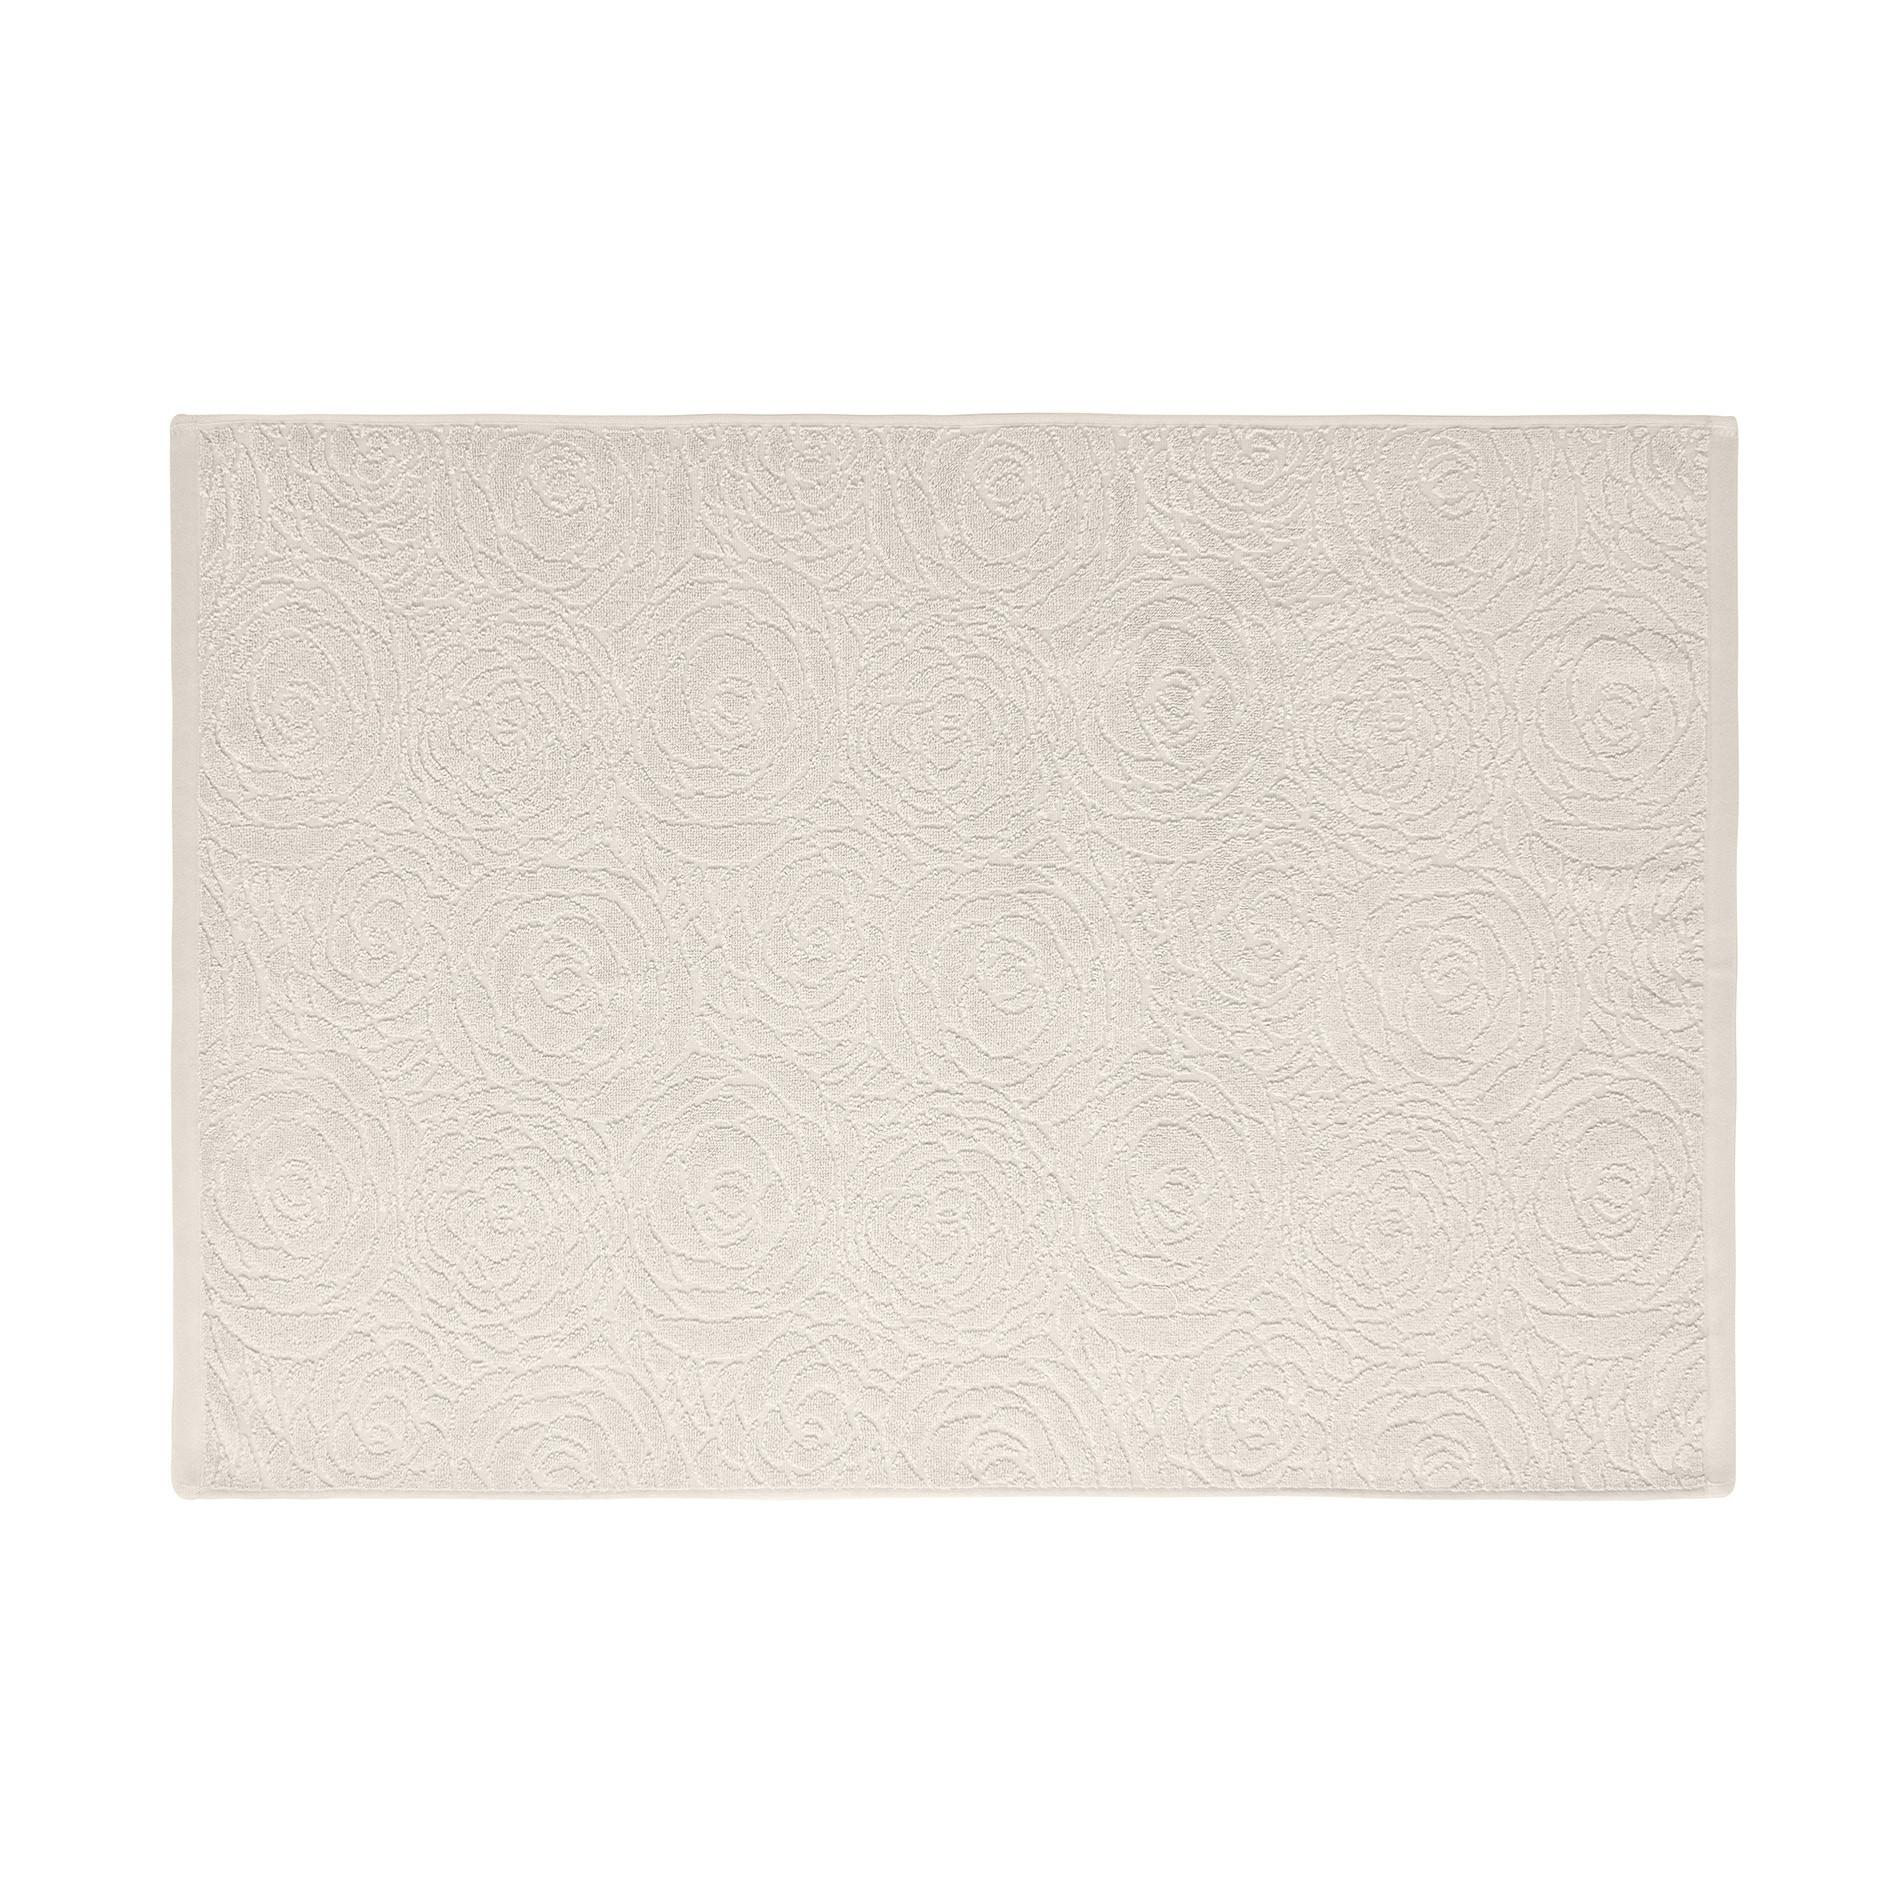 Asciugamano spugna puro cotone rose inglesi Portofino, Beige, large image number 2